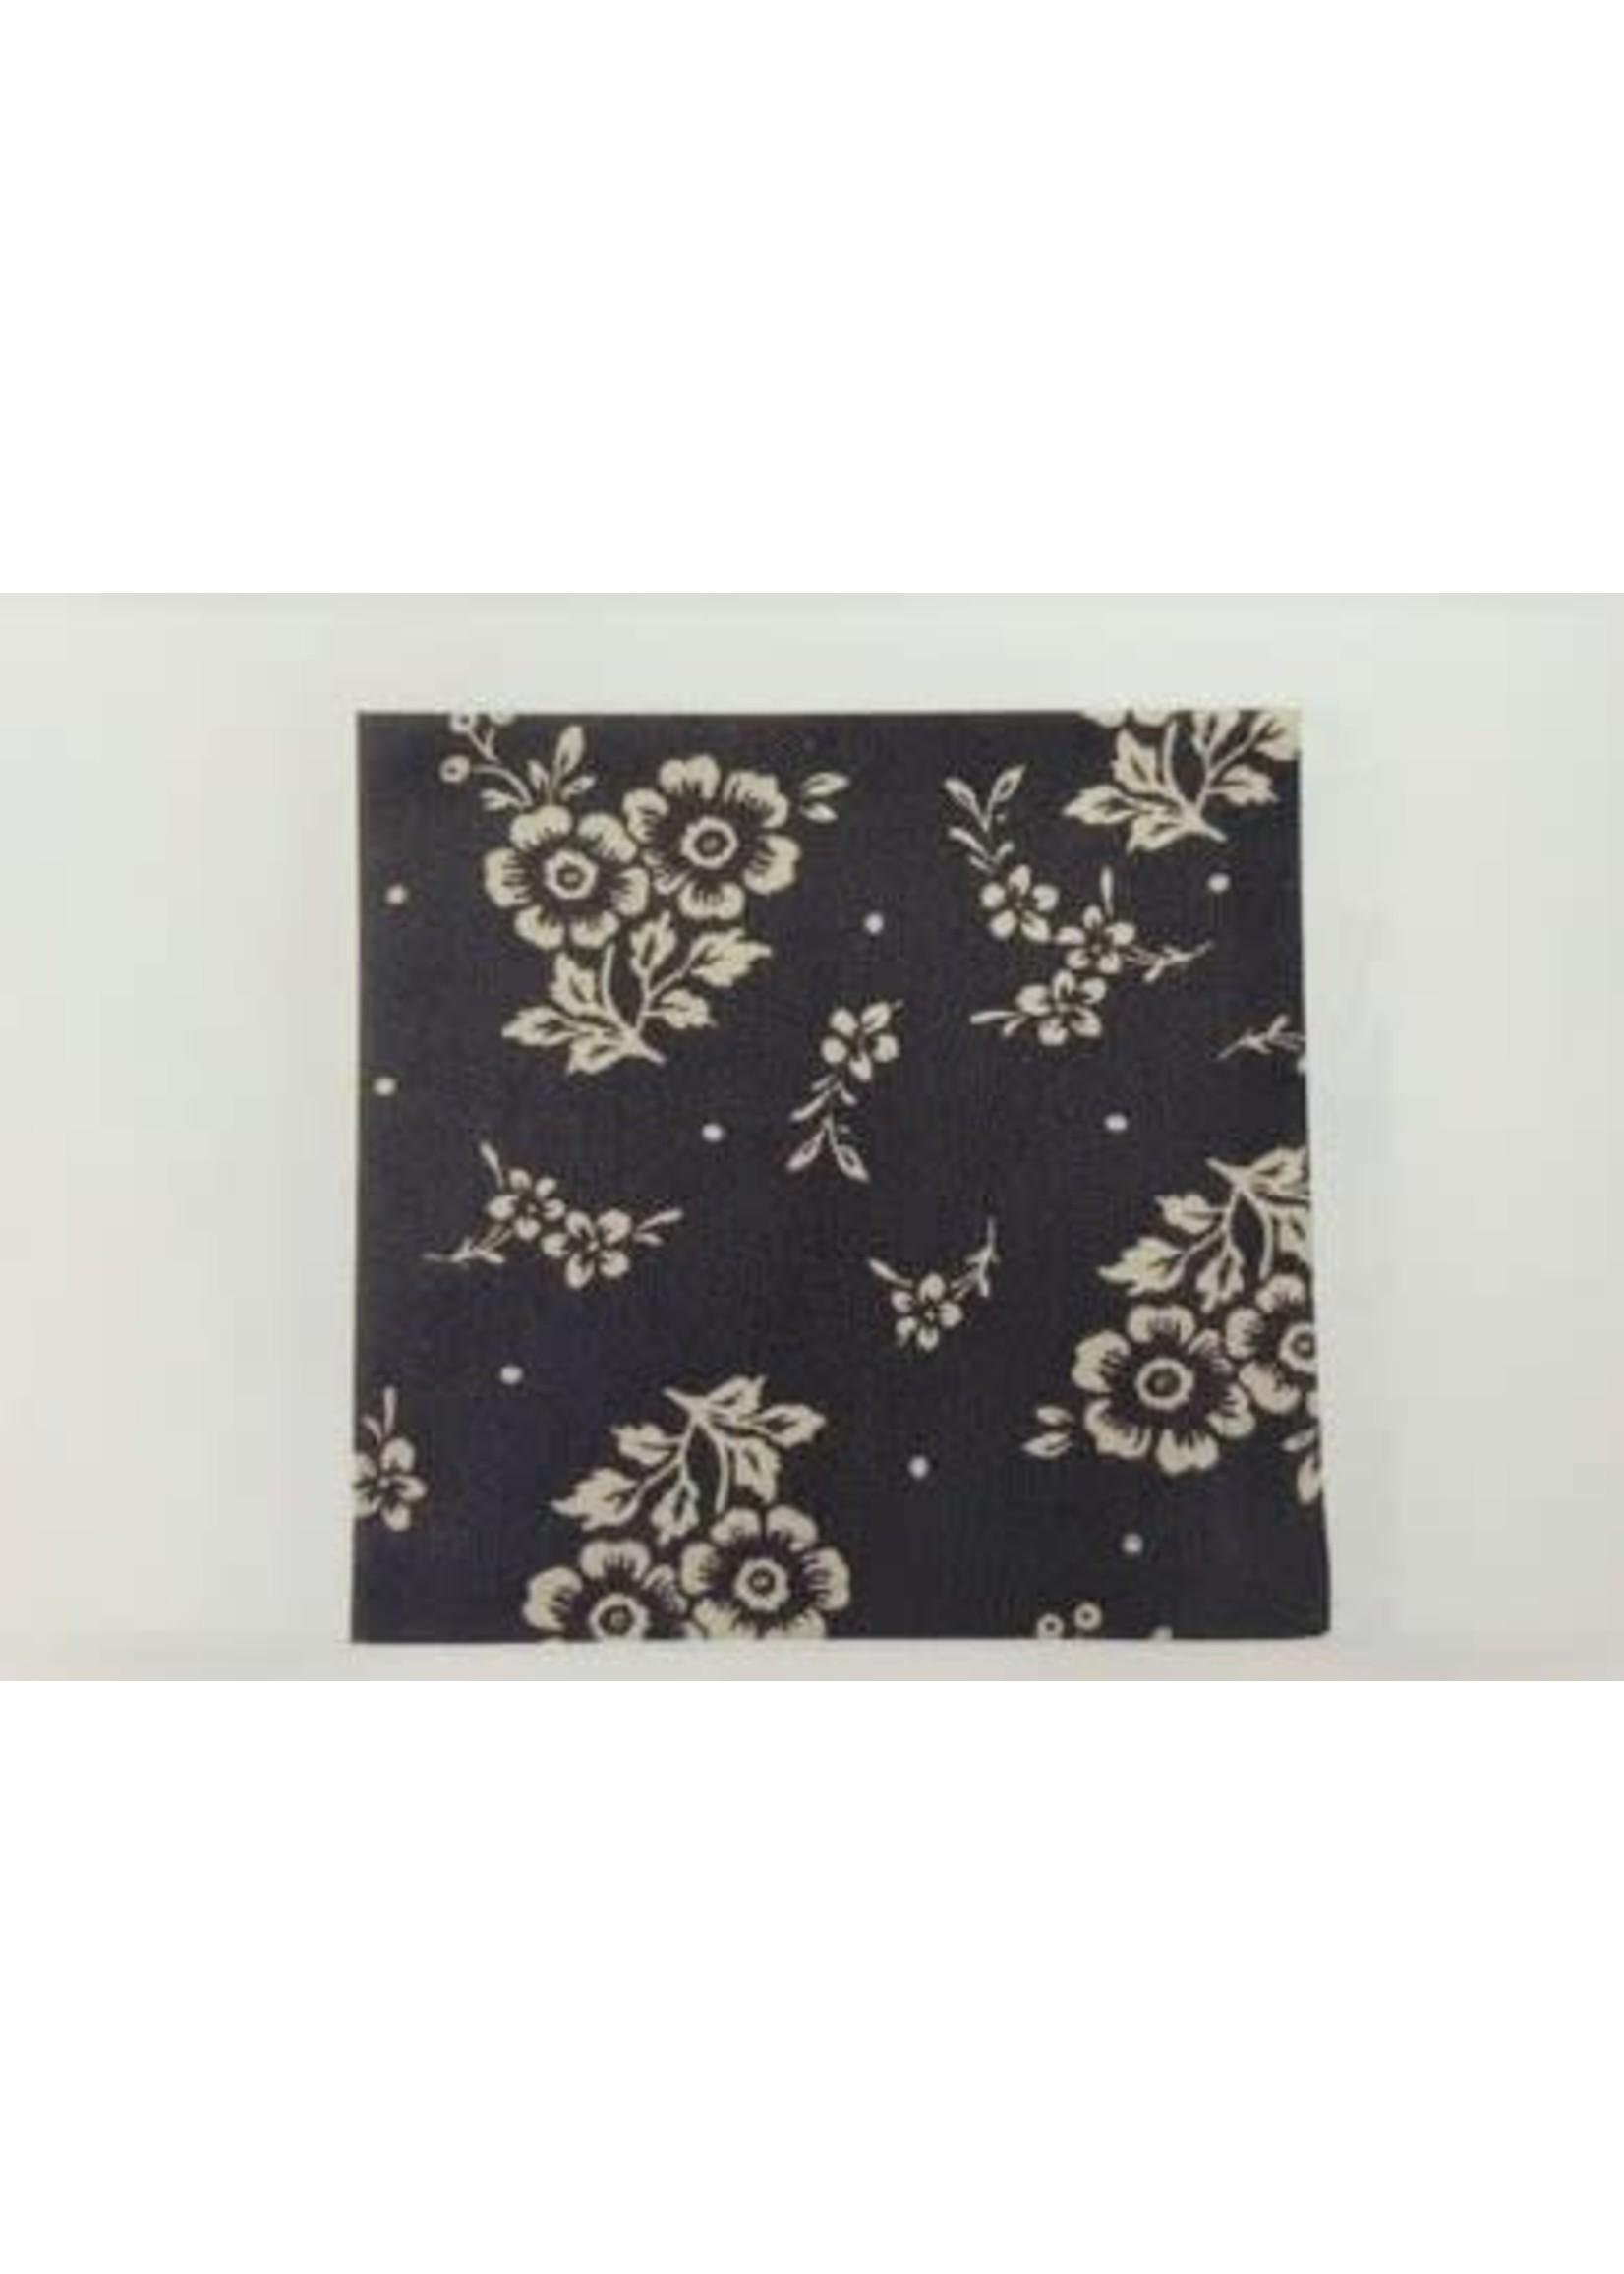 MAYFLOWER BLACK HAND TOWEL